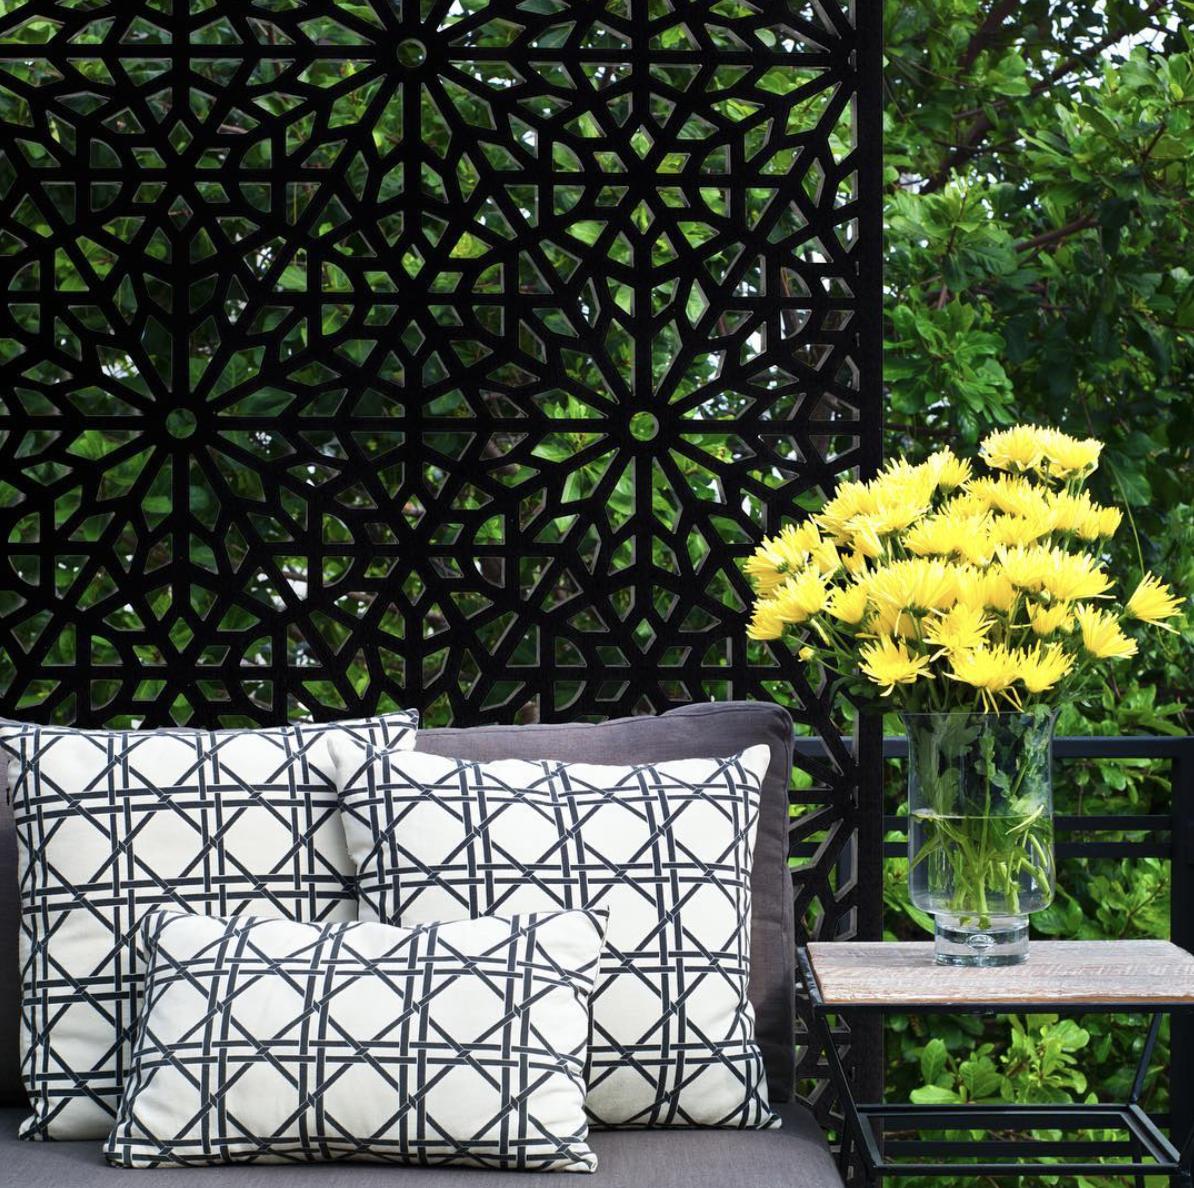 Garden screening ideas: 13 ways to create privacy in your garden